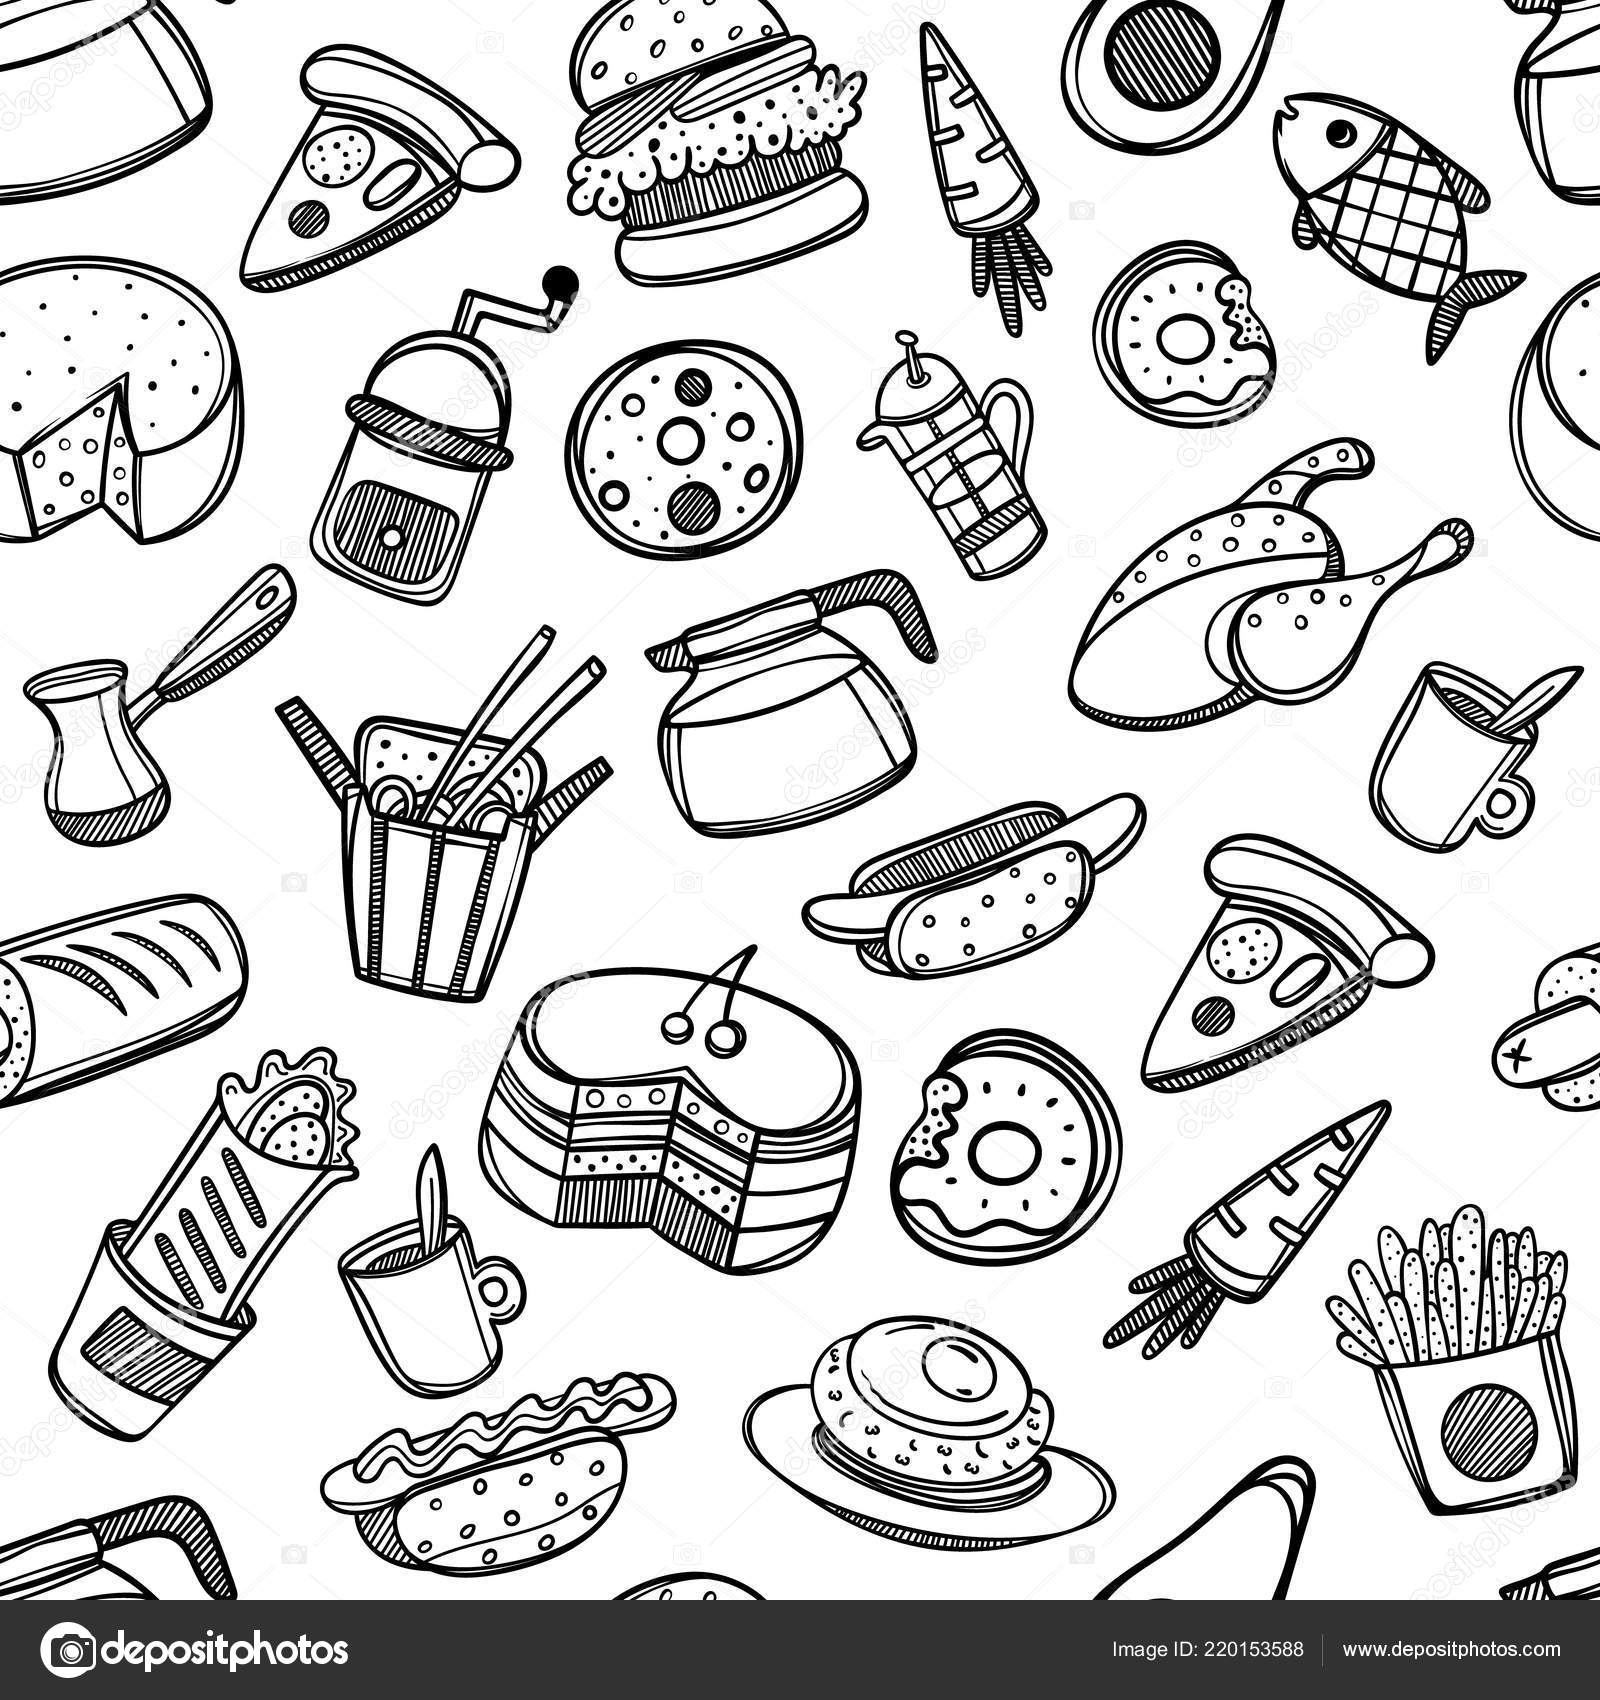 Dibujos Animados Lindo Alimentos Utensilios Cocina Fondo Blanco